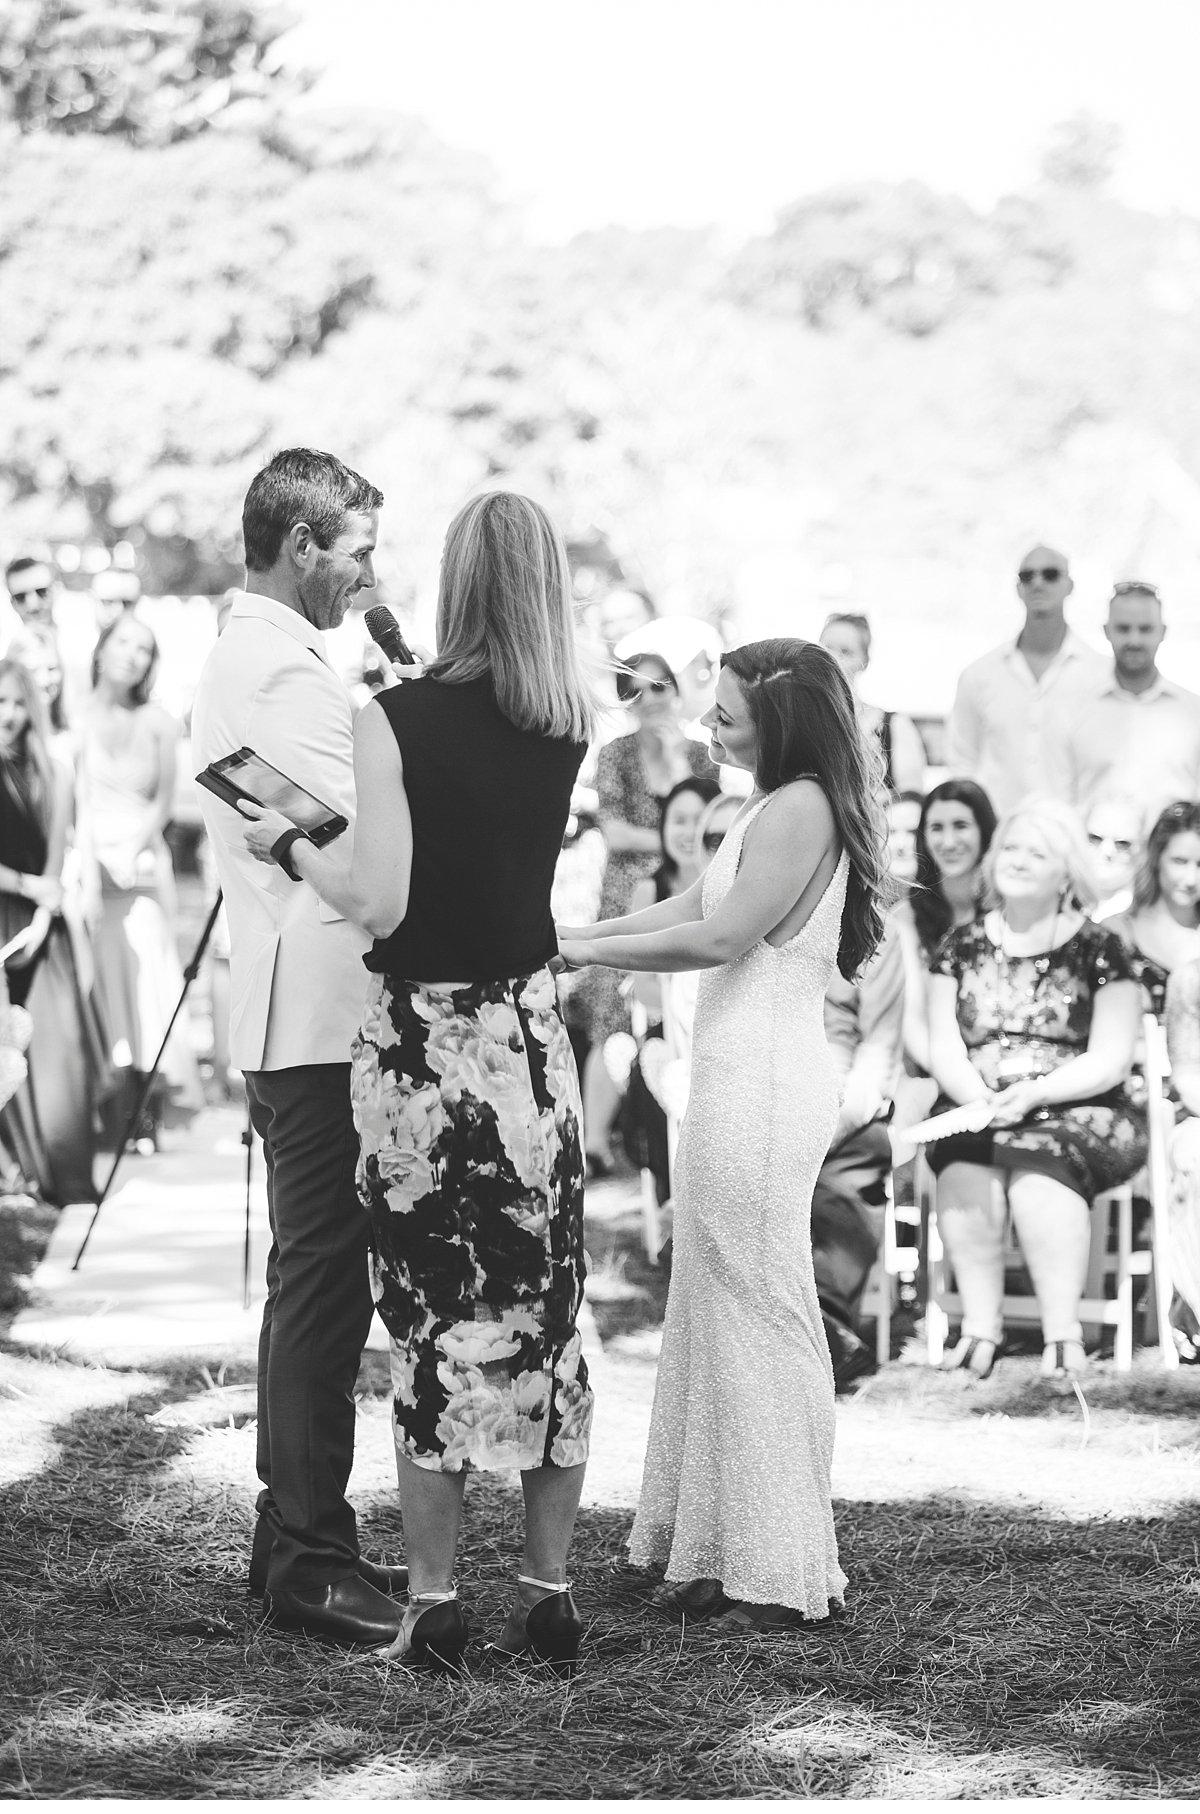 Wagga Wagga Wedding Photographer Sydney Wedding Bondi Beach Australian Wedding Photographer_0437